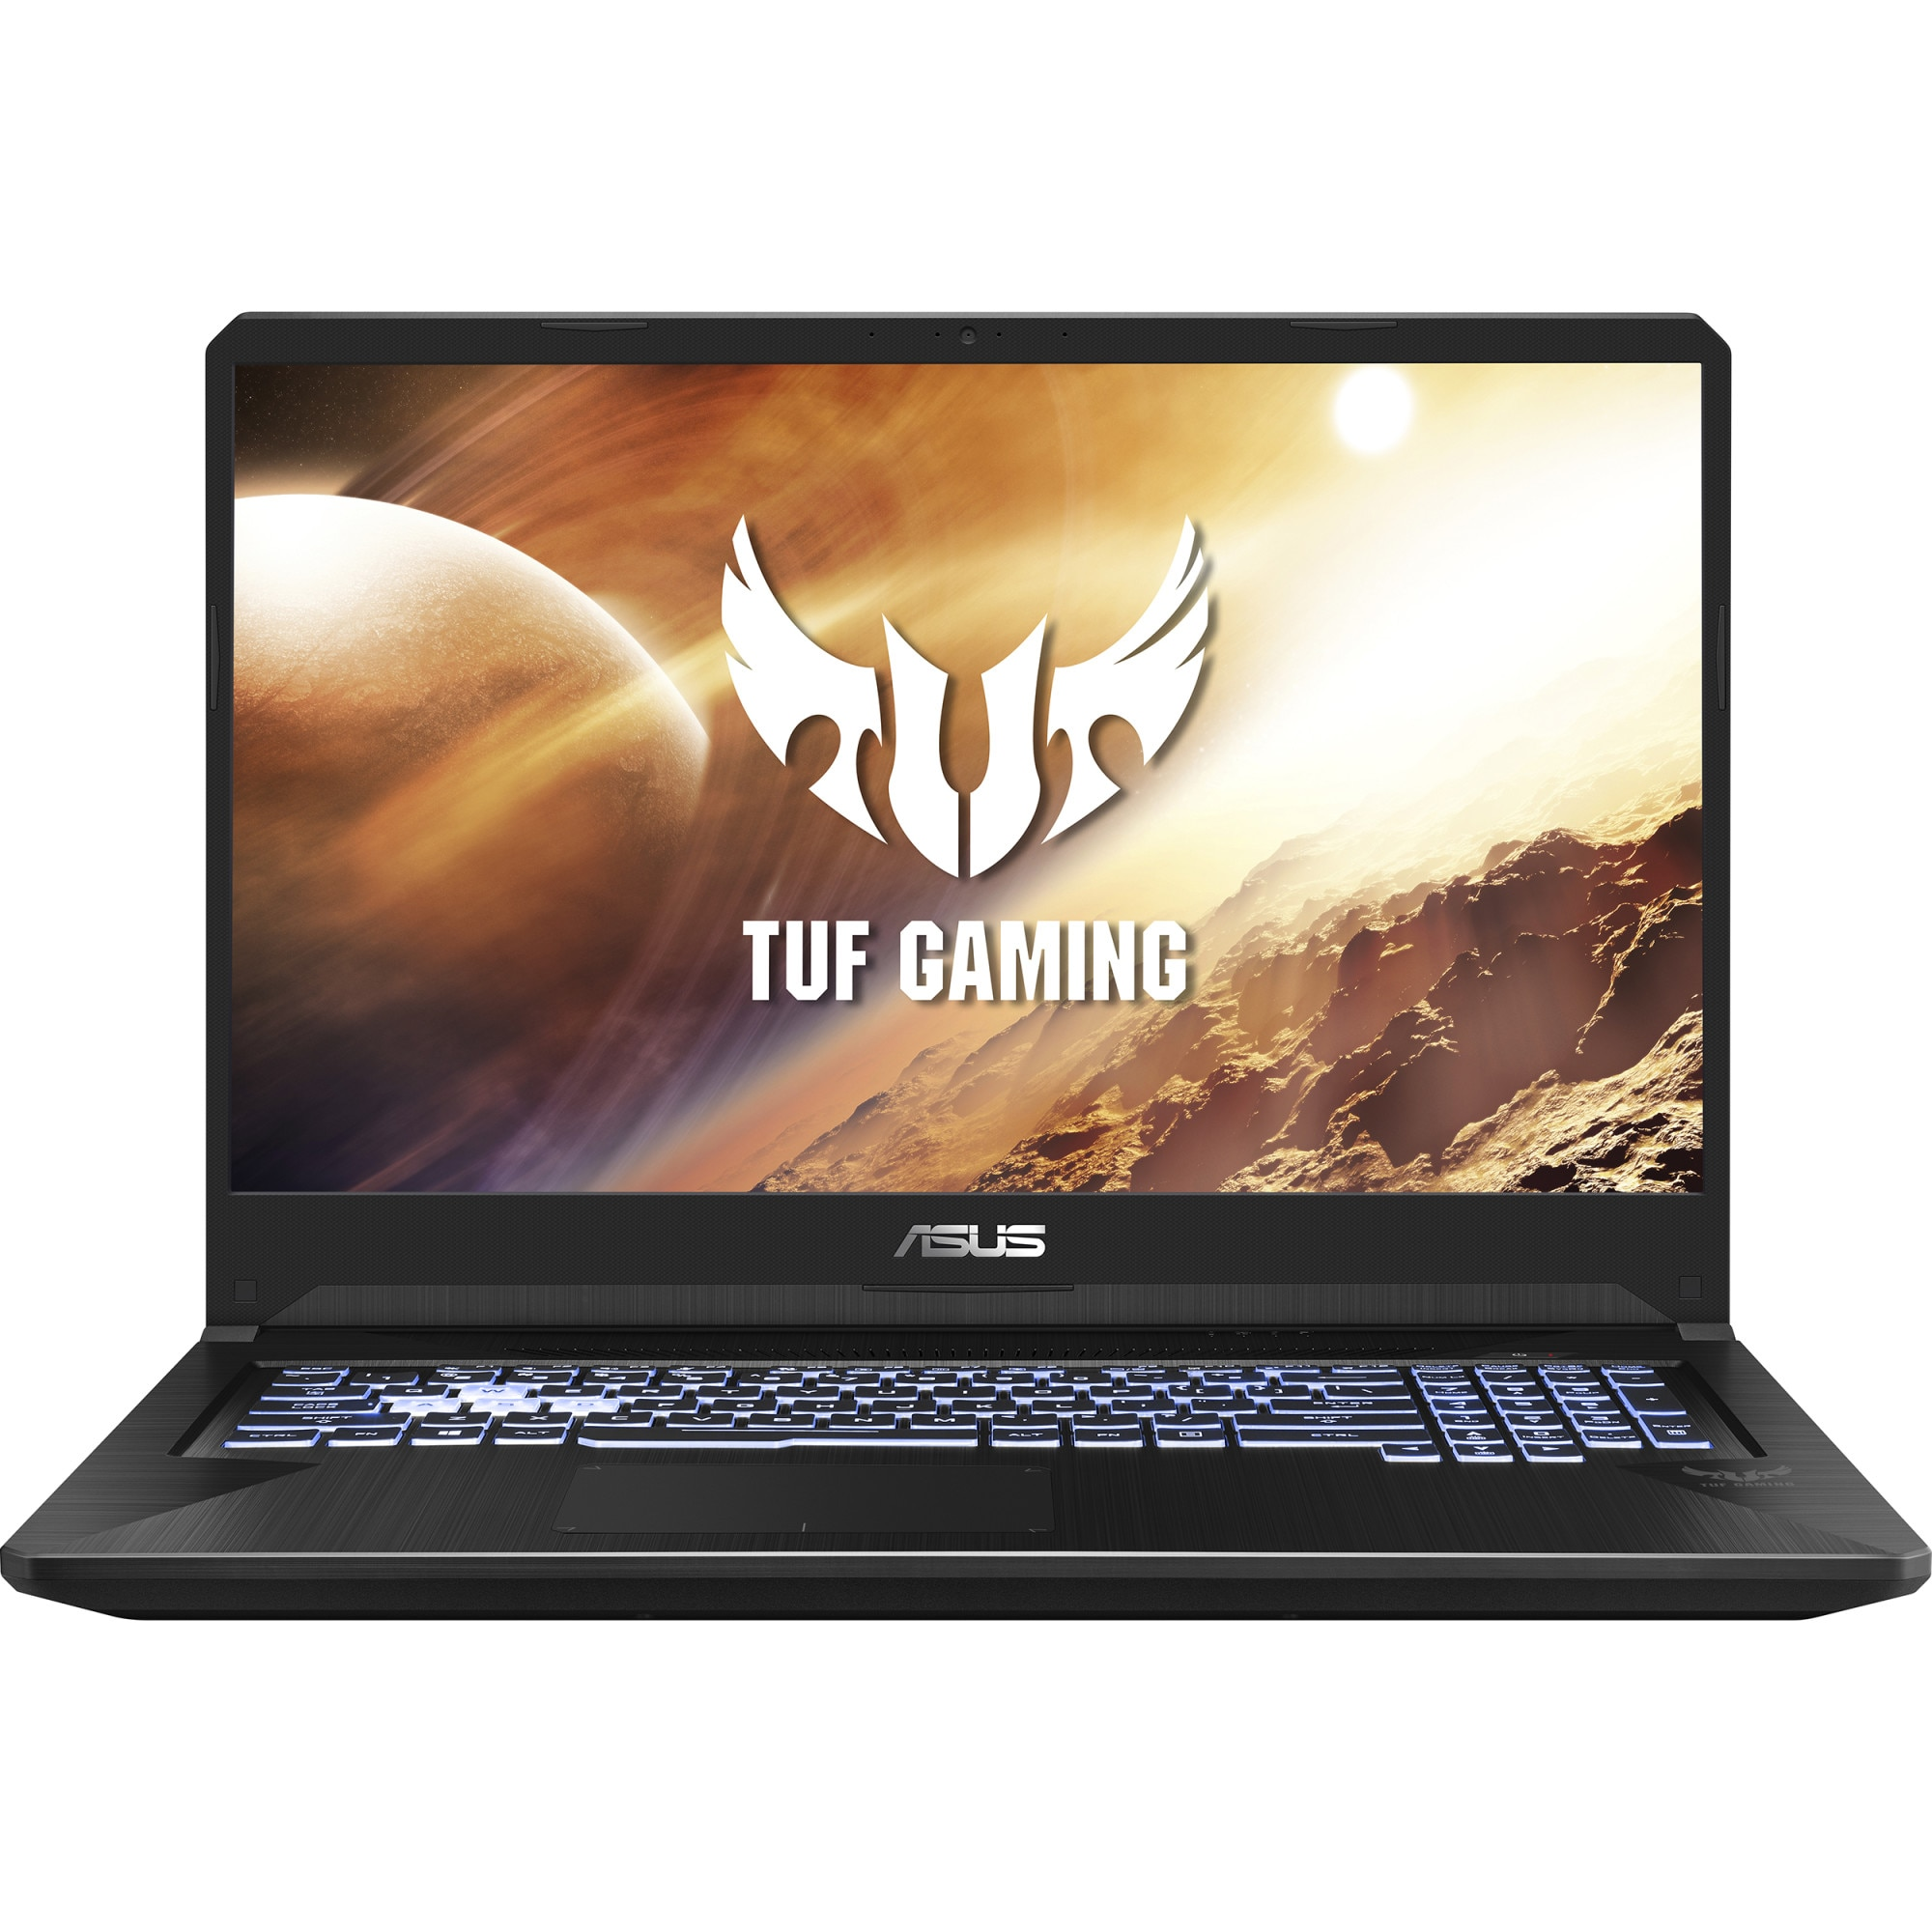 "Fotografie Laptop Gaming ASUS TUF FX505DT cu procesor AMD Ryzen™ 7 3750H pana la 4.00 GHz, 15.6"", Full HD, 144Hz, 16GB, 512GB SSD, NVIDIA® GeForce® GTX 1650 4GB, Free DOS, Gold Steel"